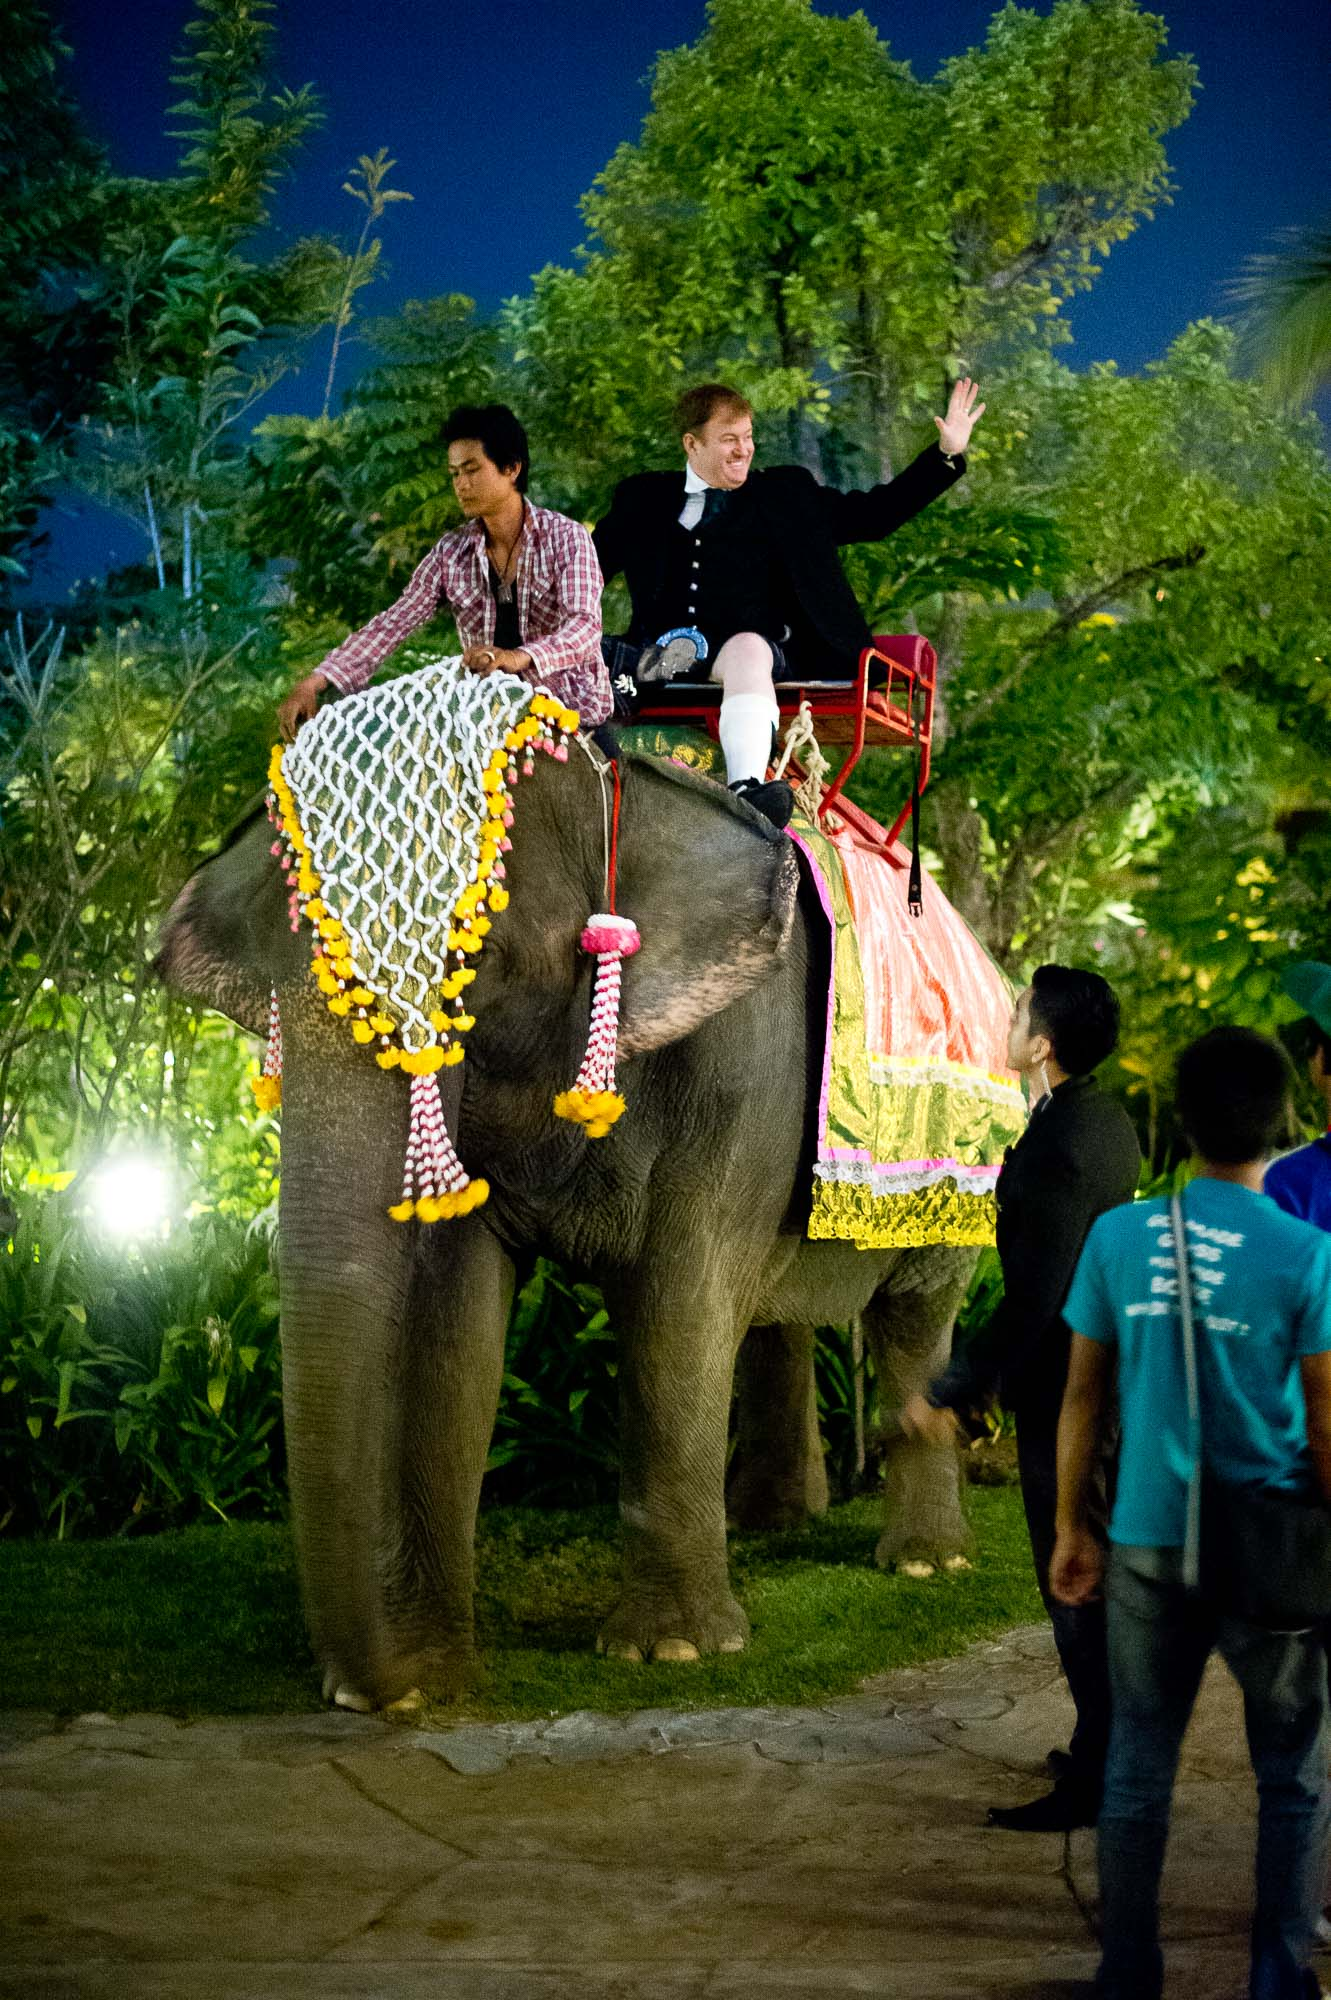 Thailand Centara Grand Mirage Beach Resort Pattaya Wedding Photography   NET-Photography Thailand Wedding Photographer